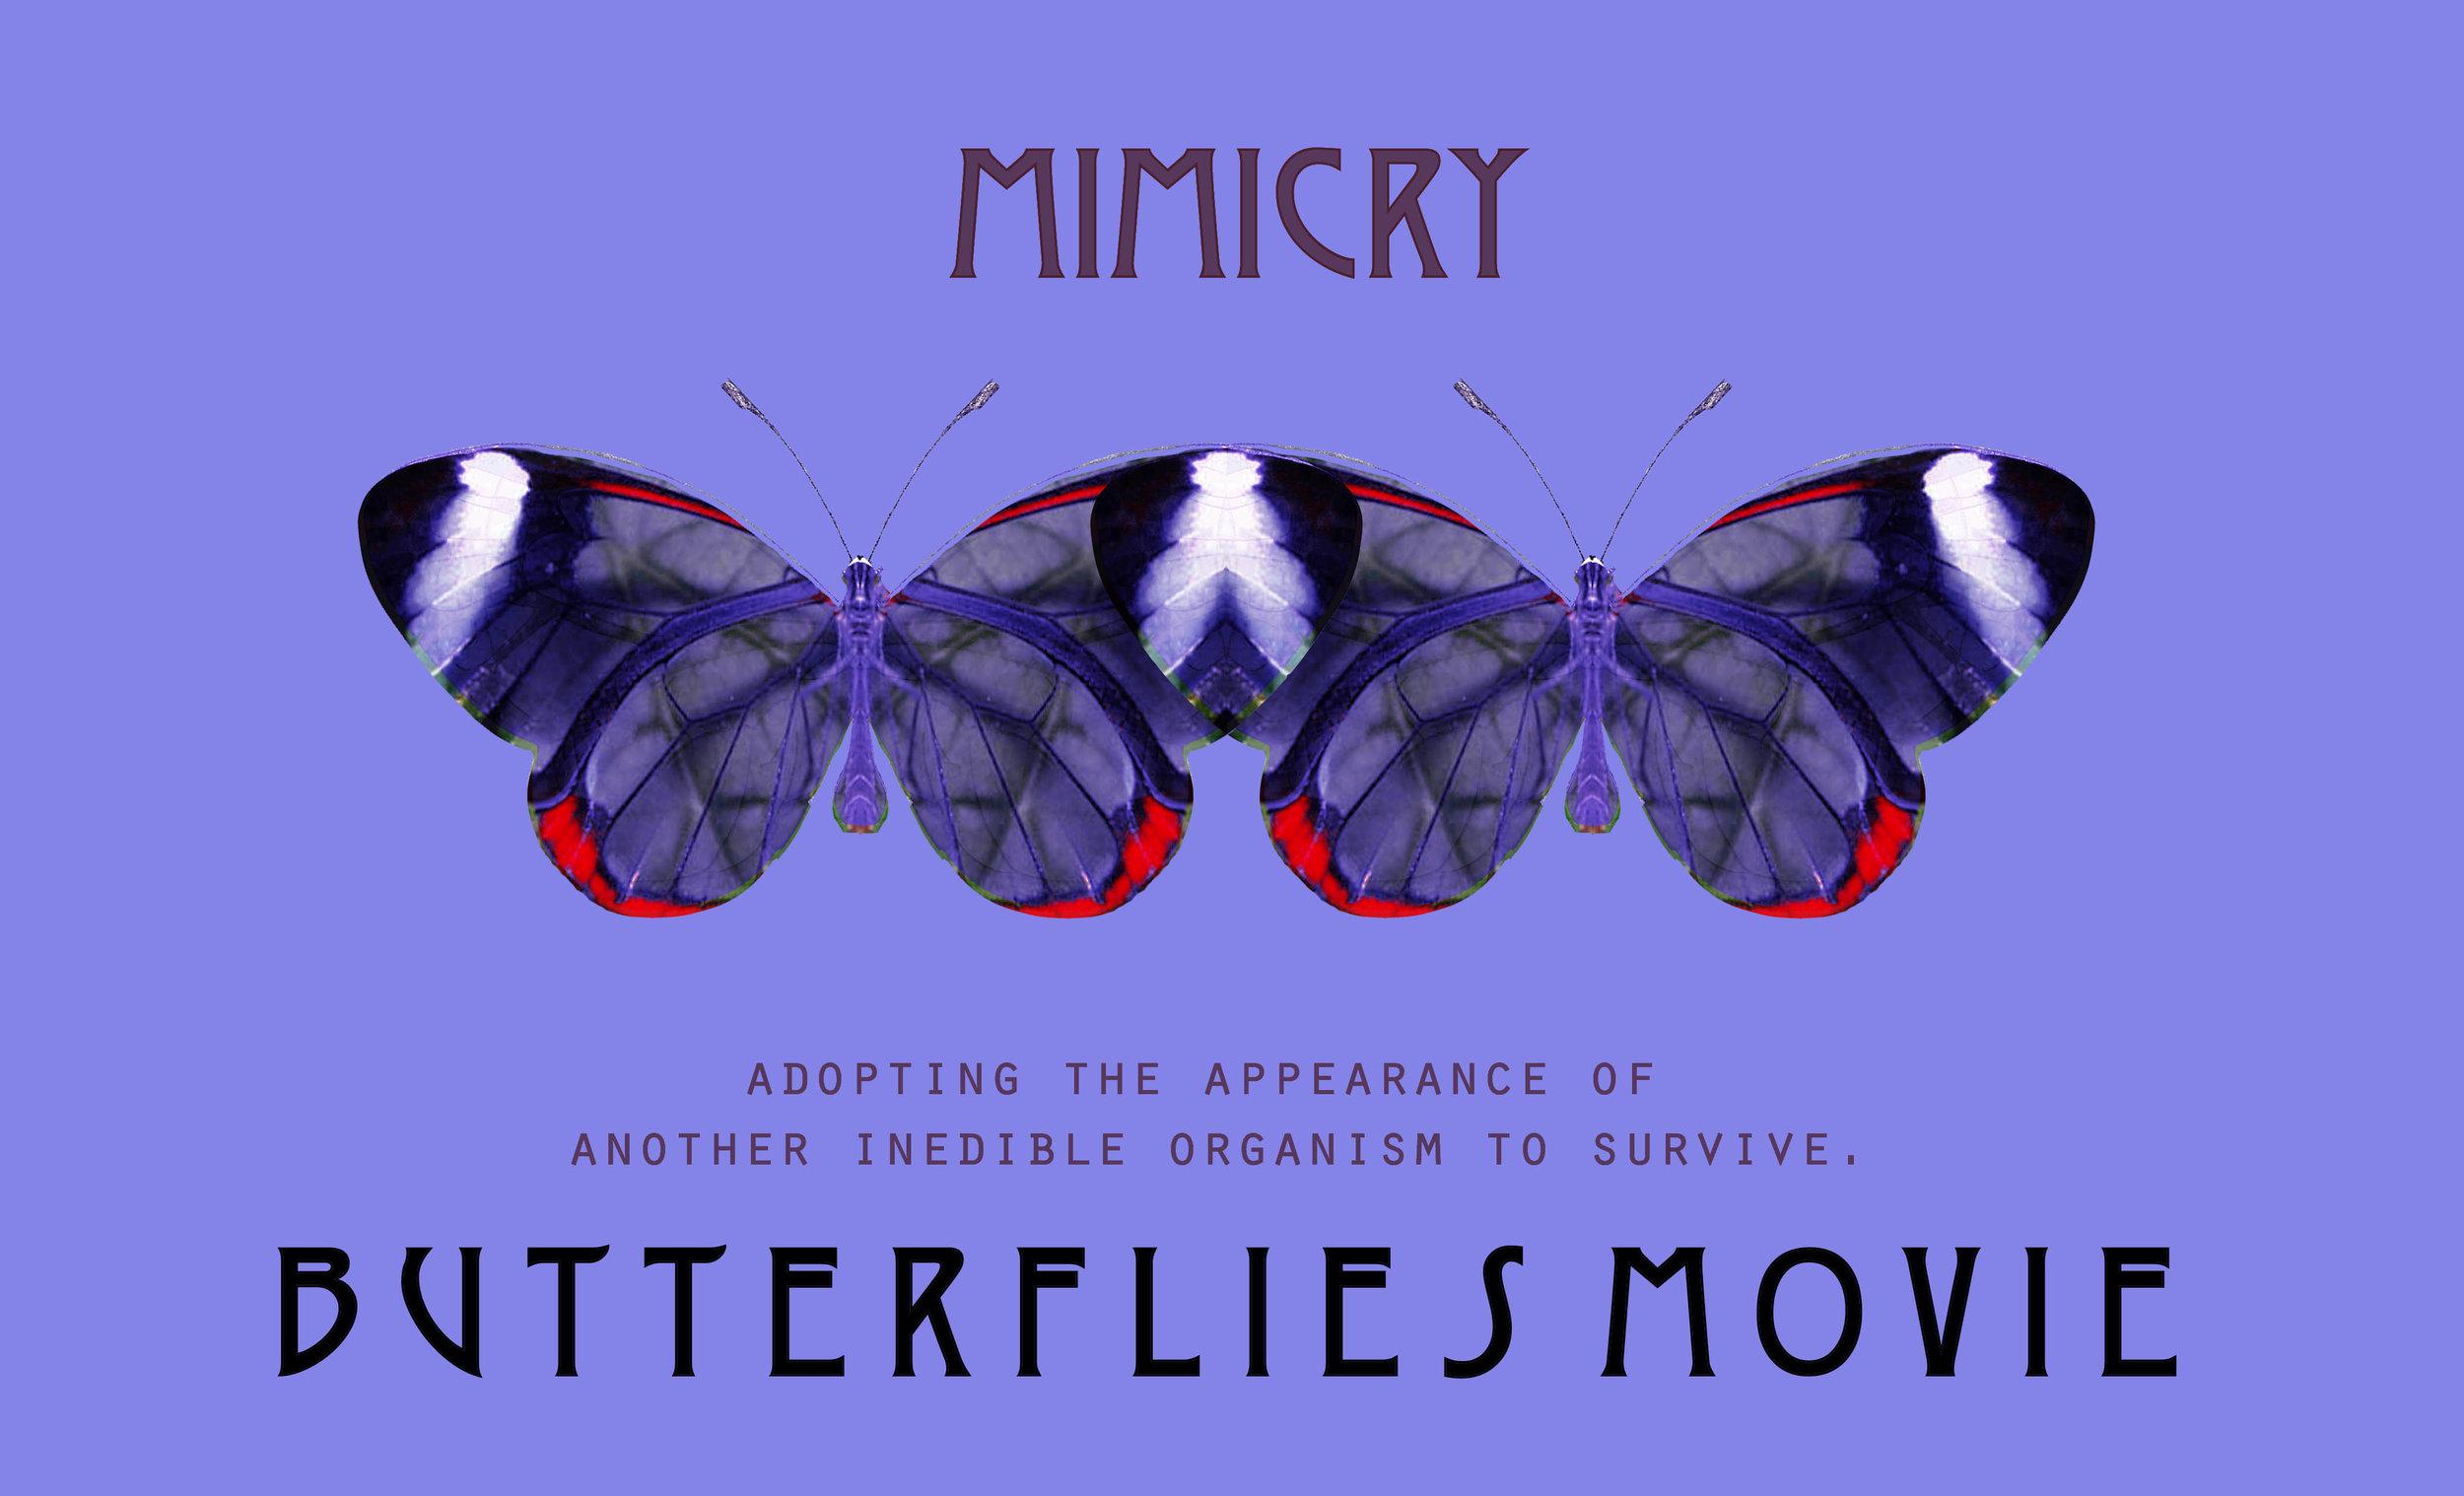 Mimicry4.jpg